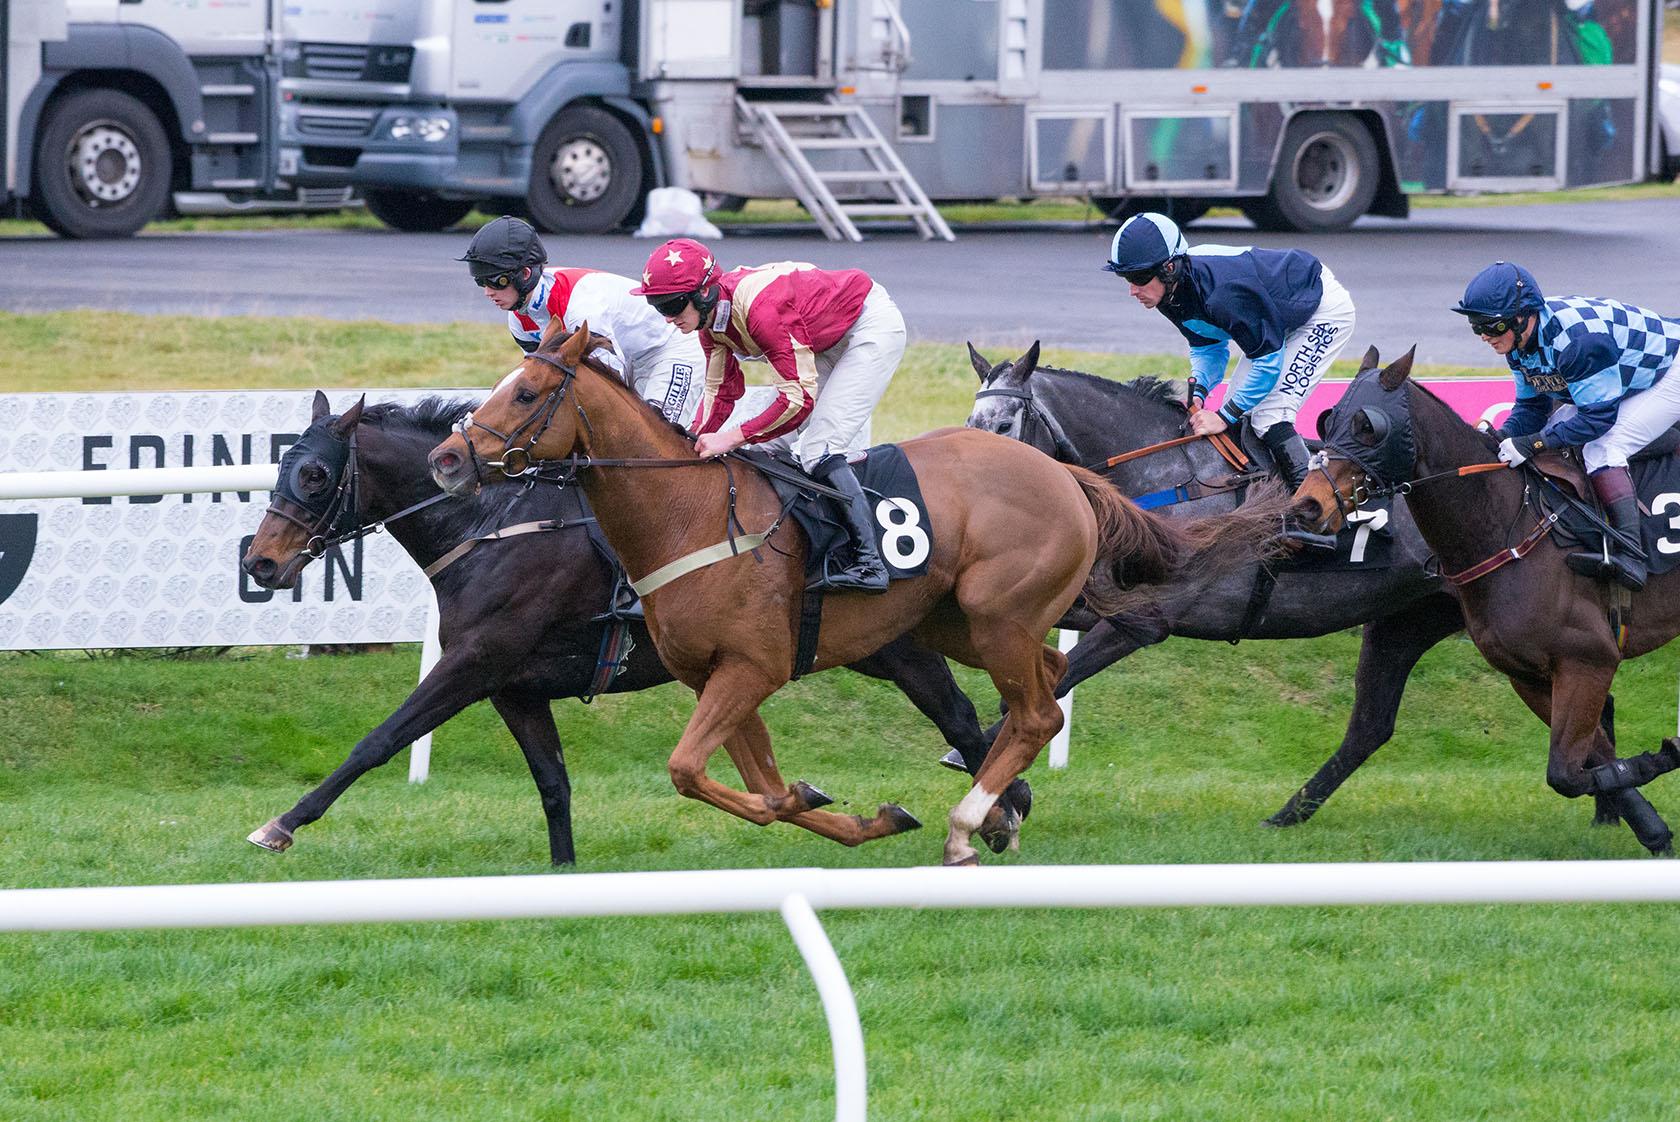 Saltire Raceday